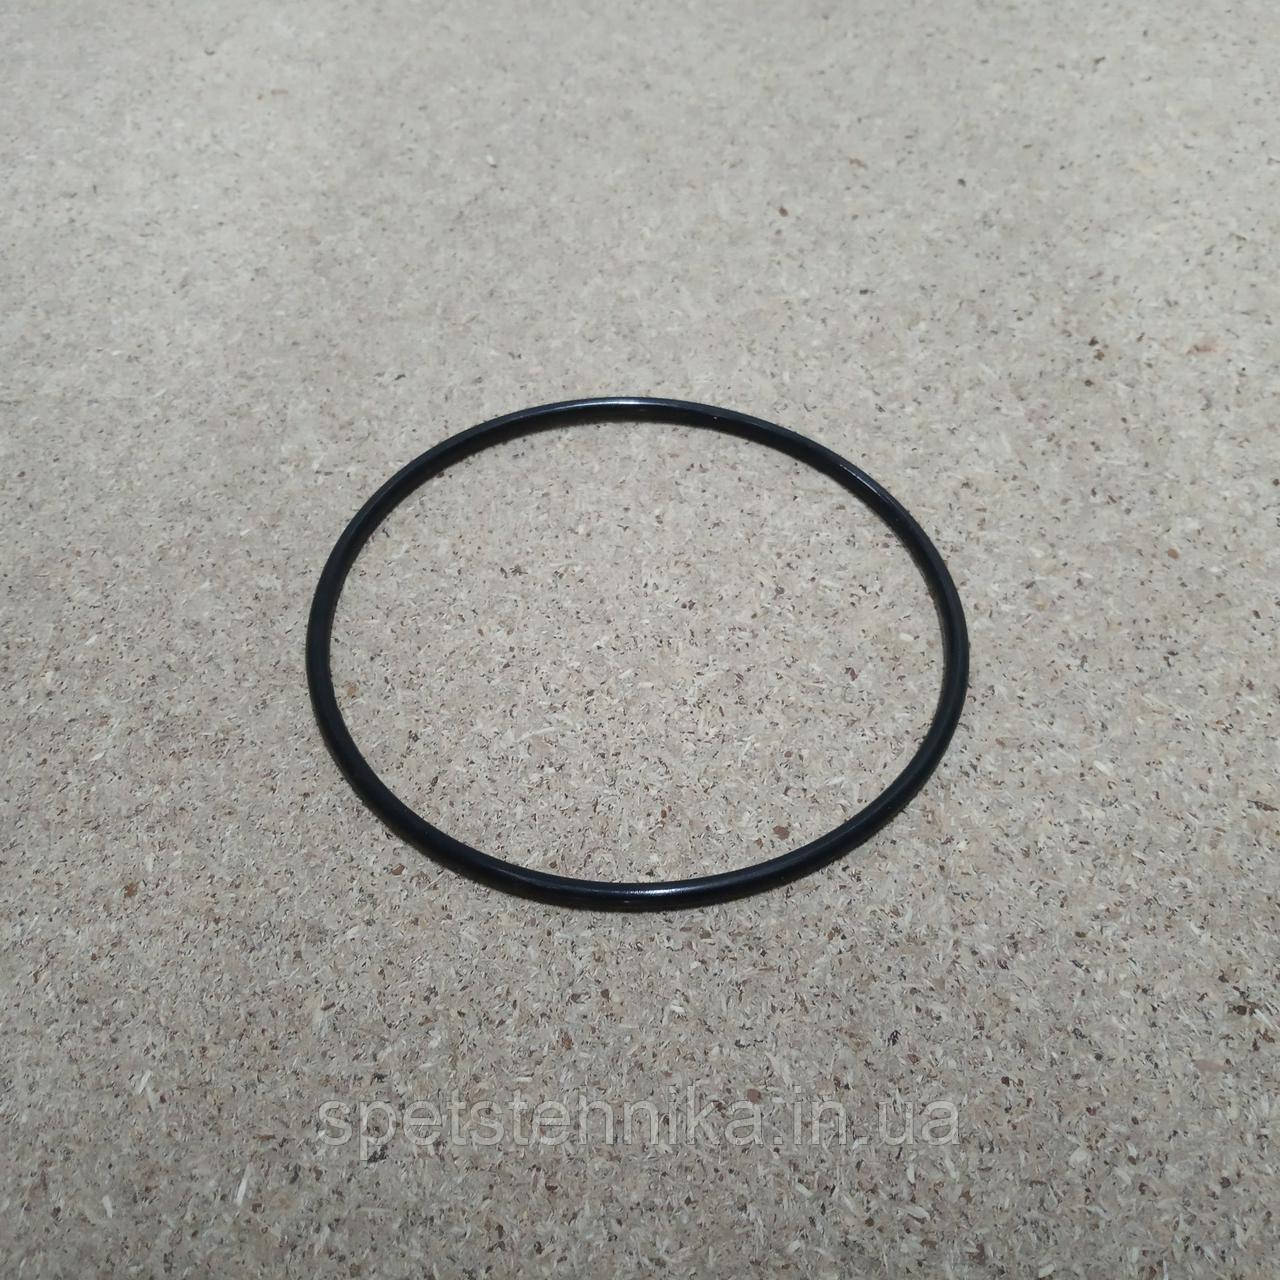 5S6670 кольцо на гильзу нижнее